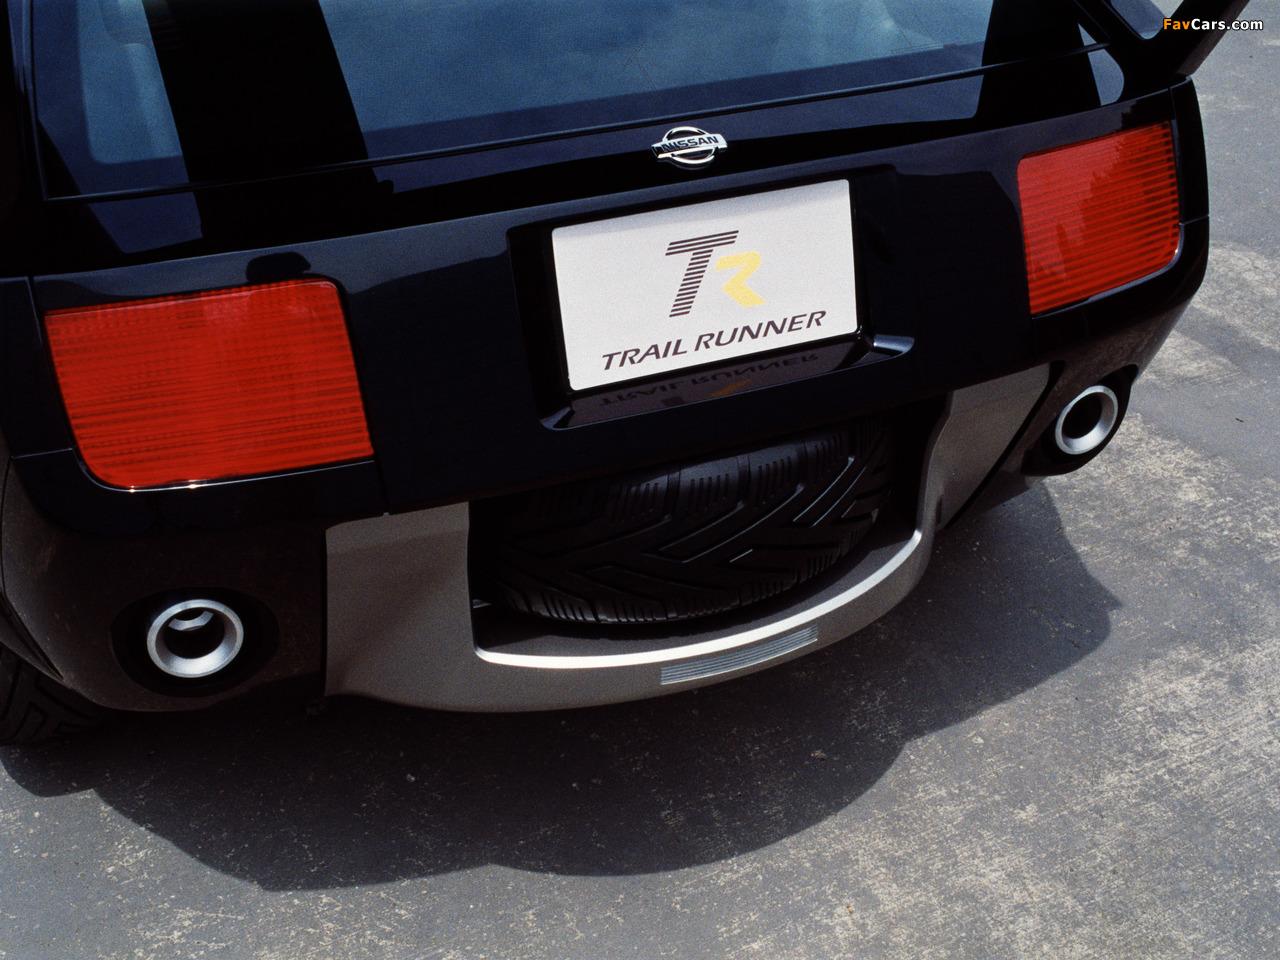 Nissan Trail Runner Concept 1997 photos (1280 x 960)